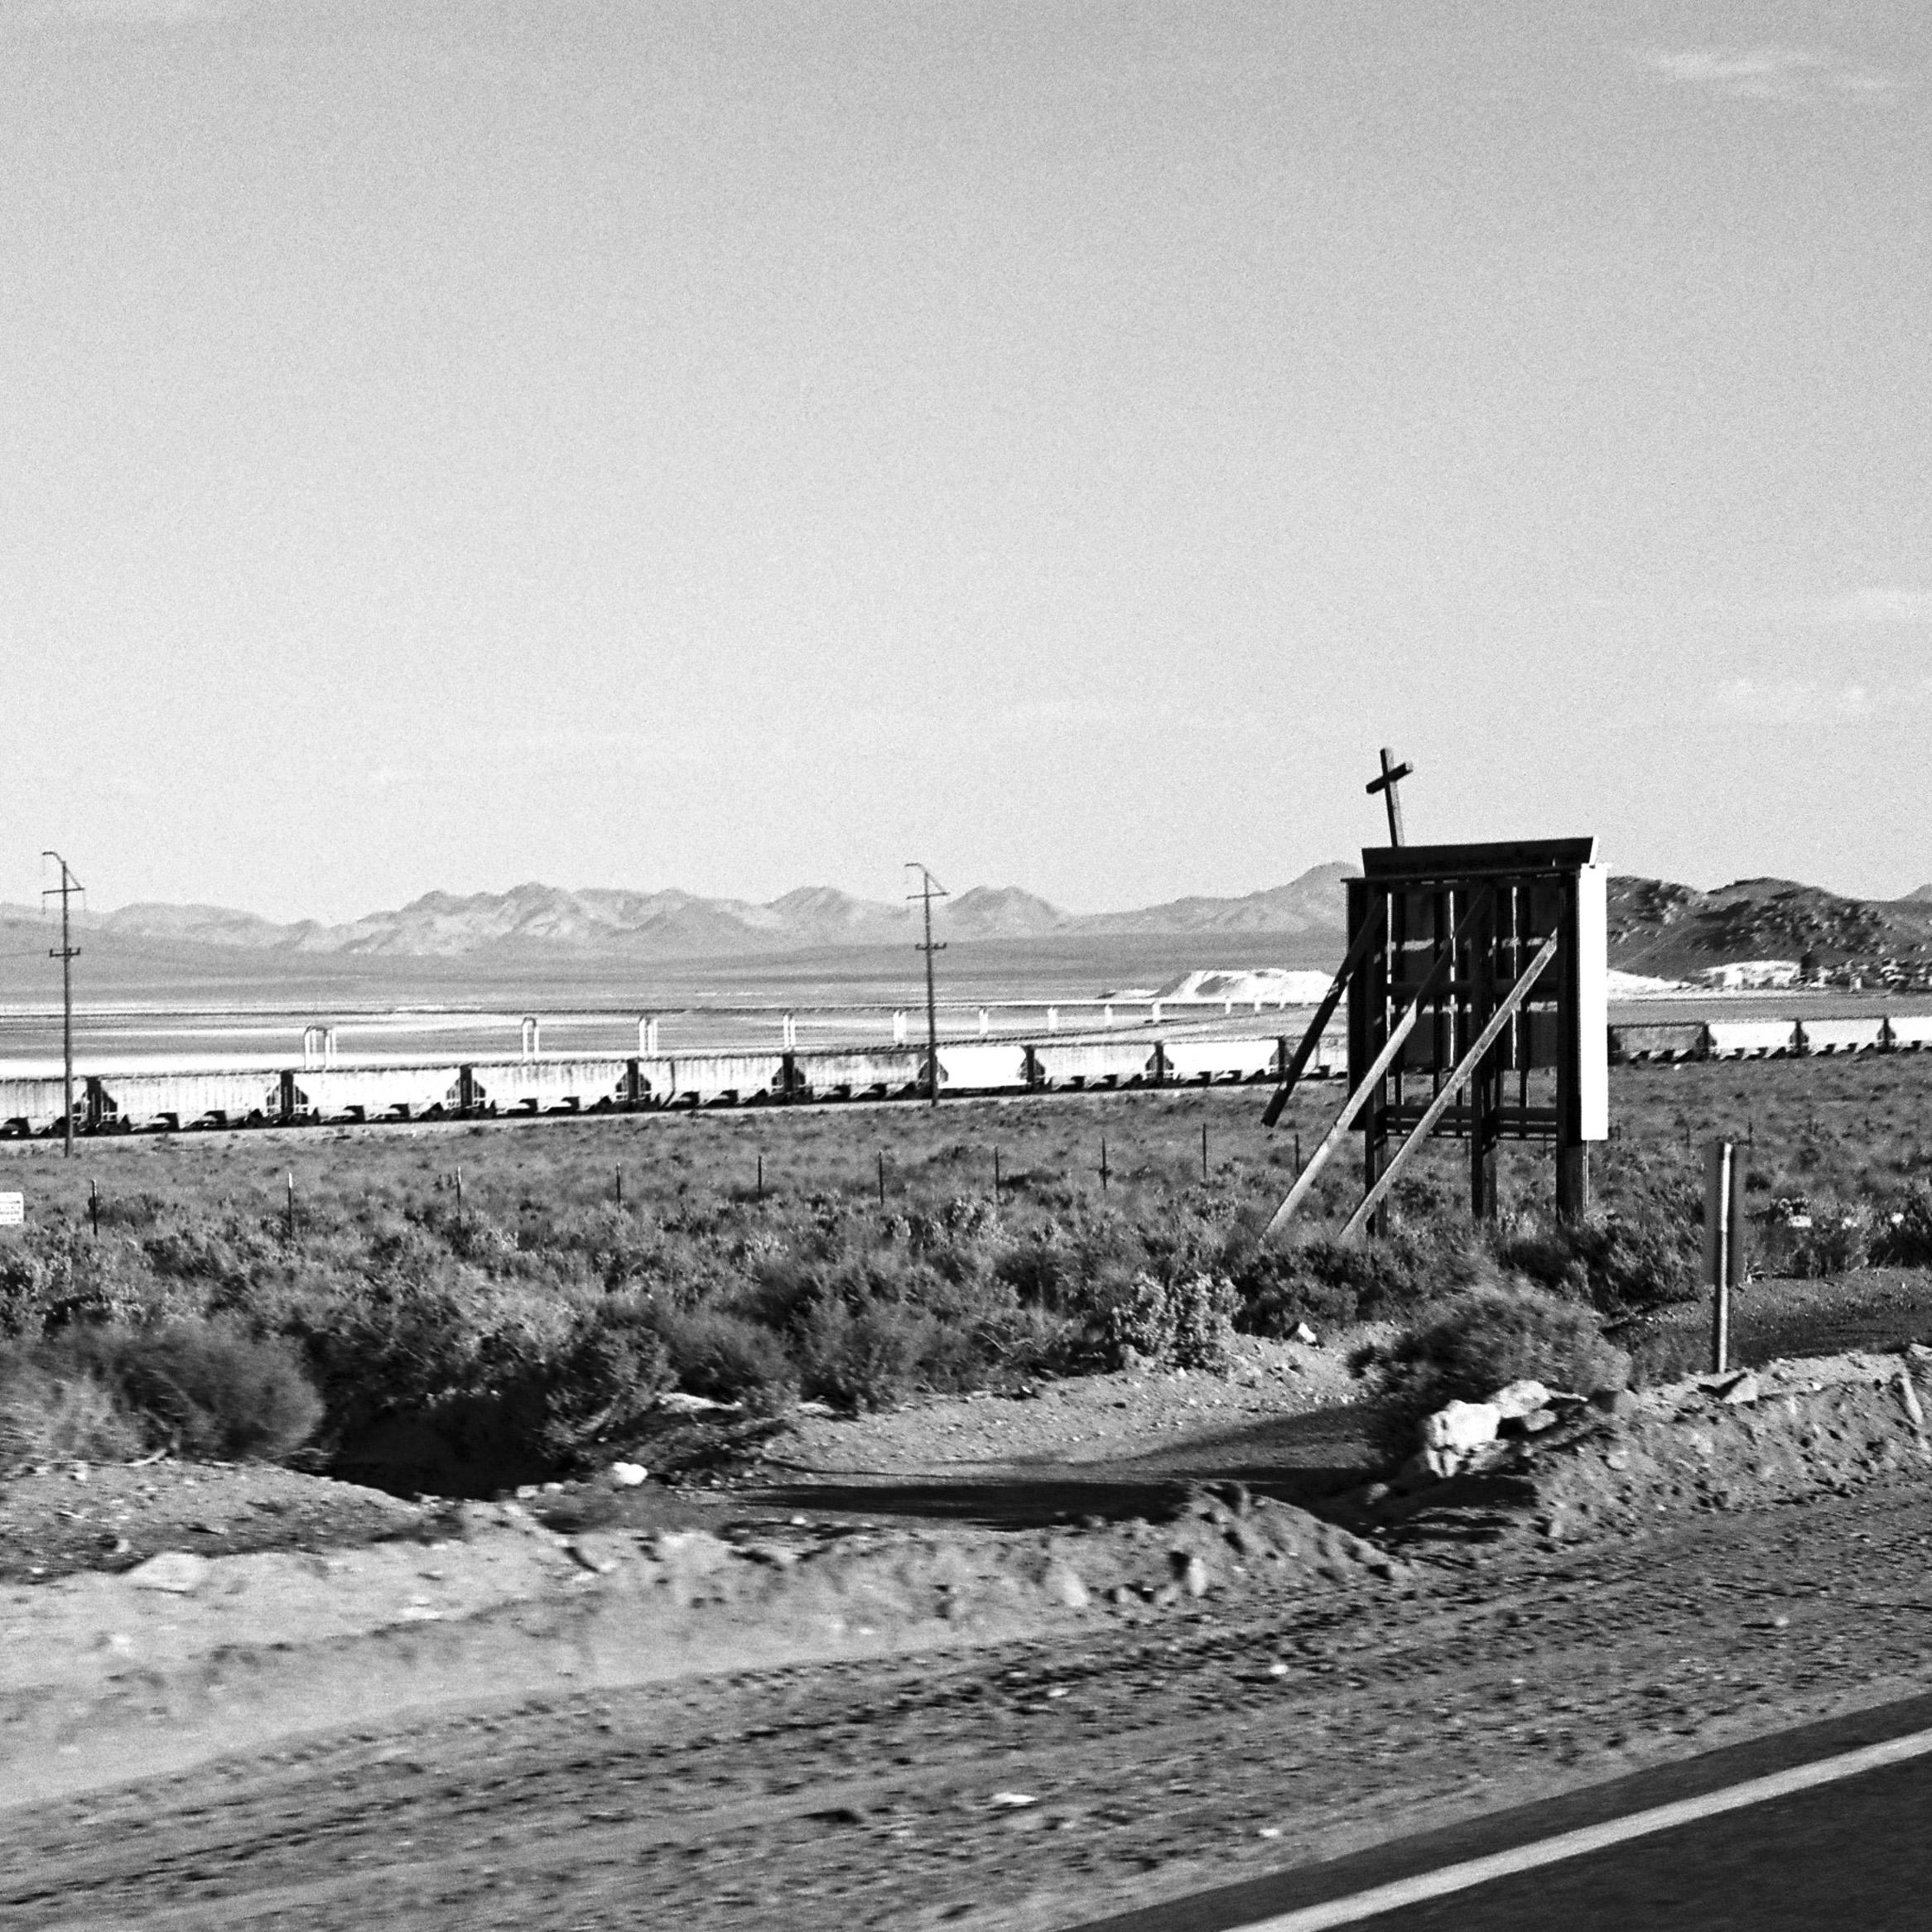 LA CALIFORNIE 08